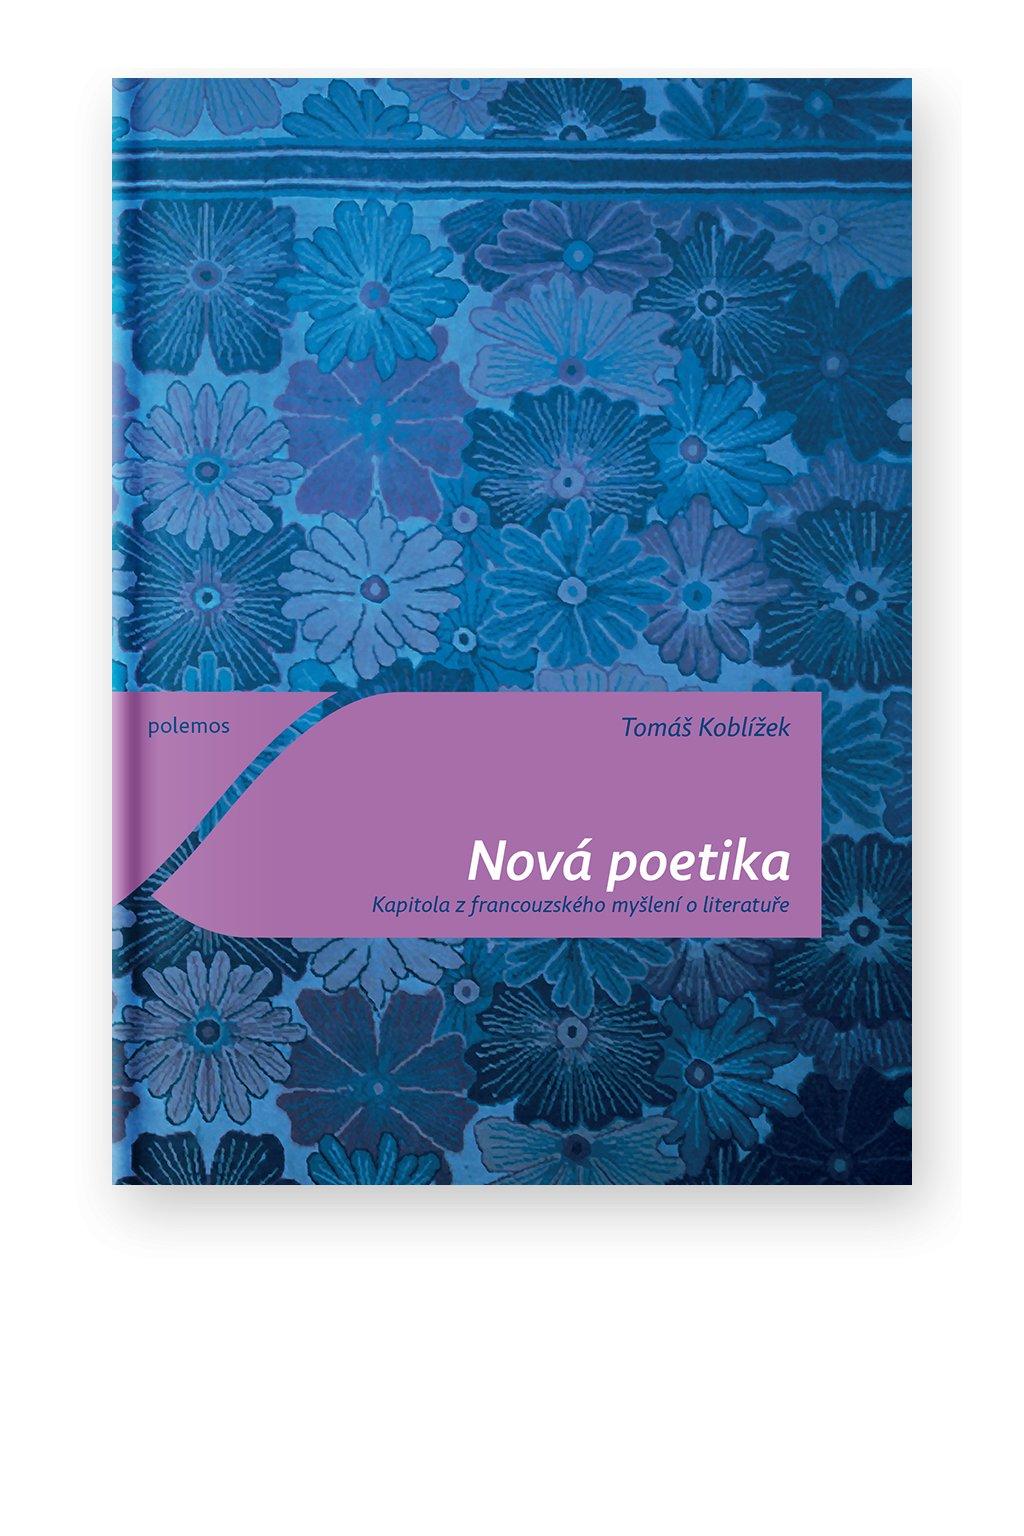 885 nova poetika